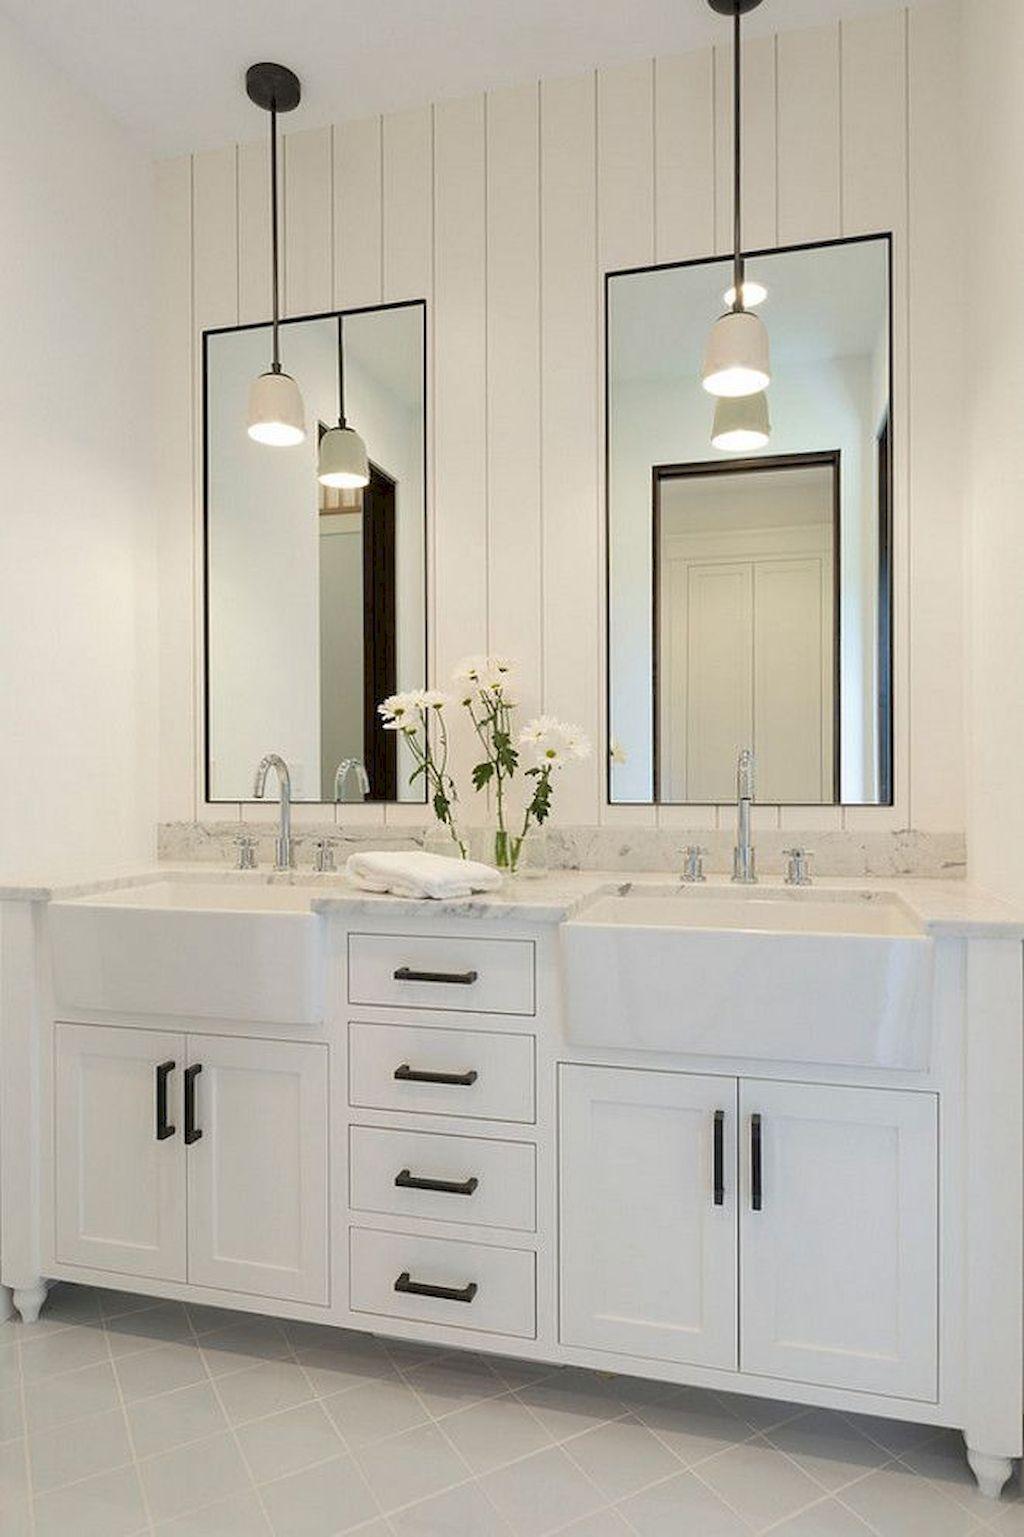 65 Rustic Farmhouse Bathroom Decor & Design Ideas | bathroom ideas ...